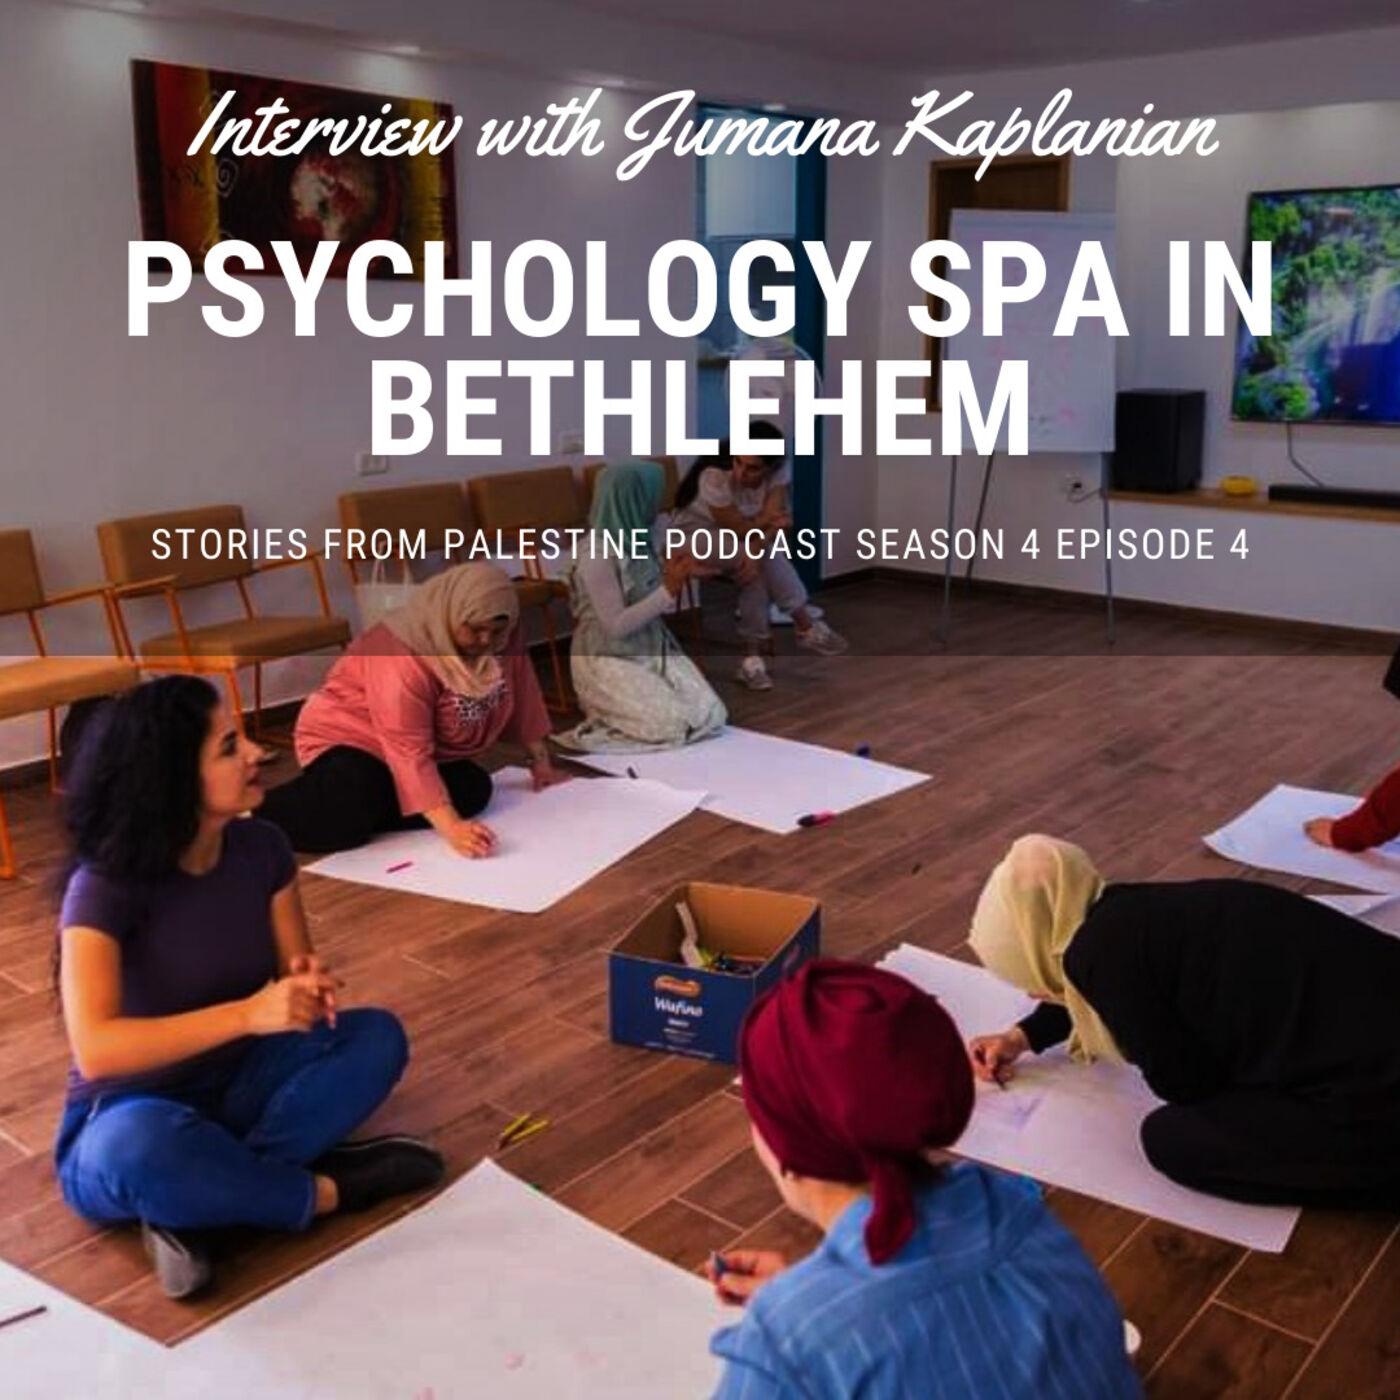 Psychology Spa in Palestine